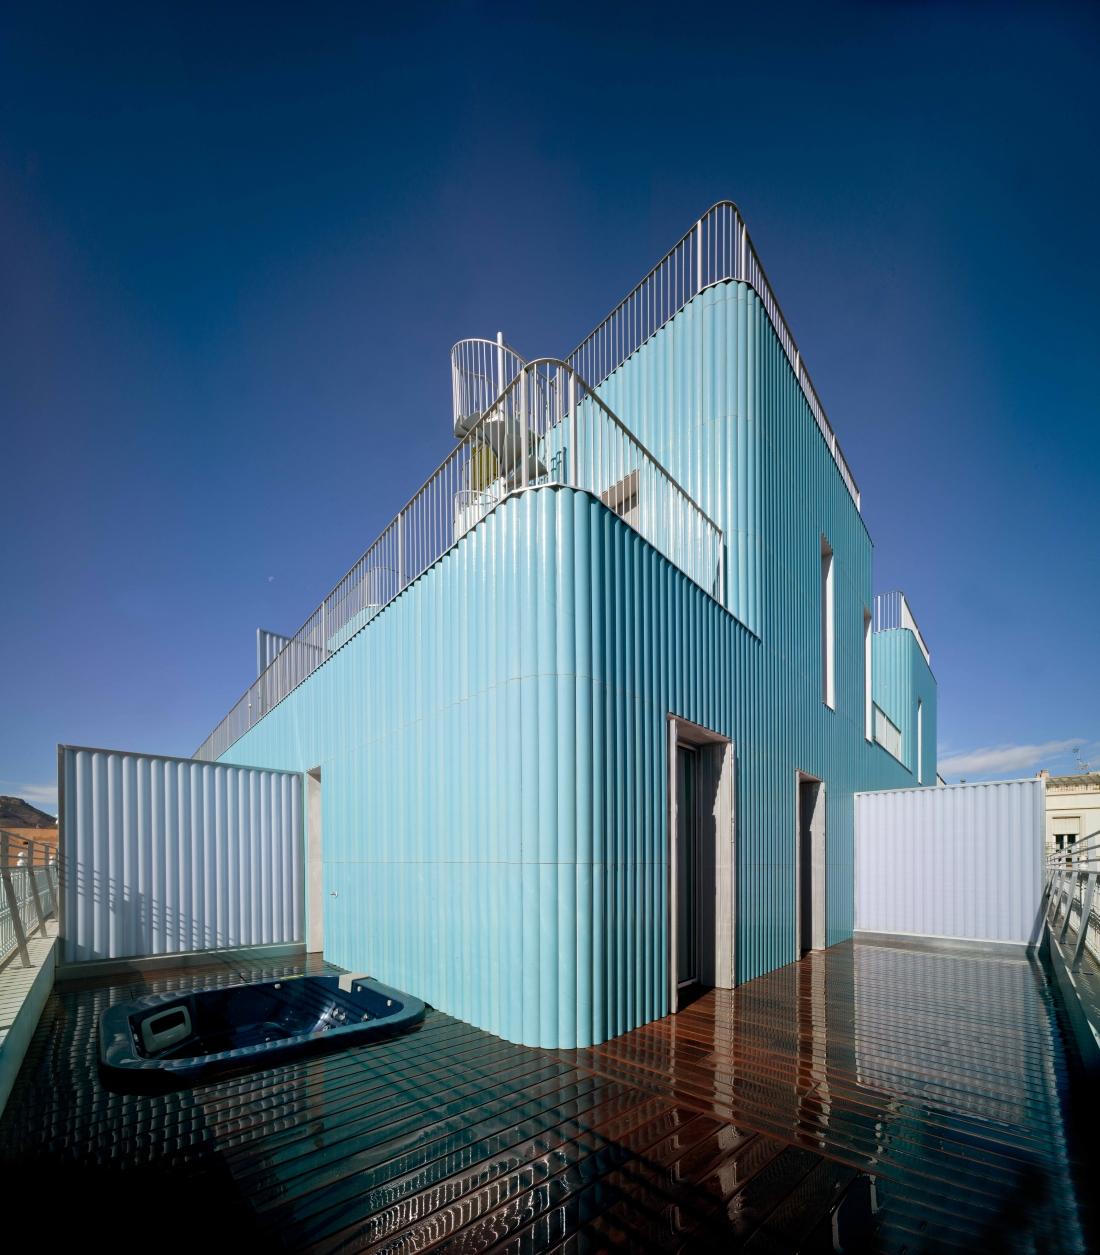 Tile of Spain - Tivoli Martin Lejarraga David Frutos